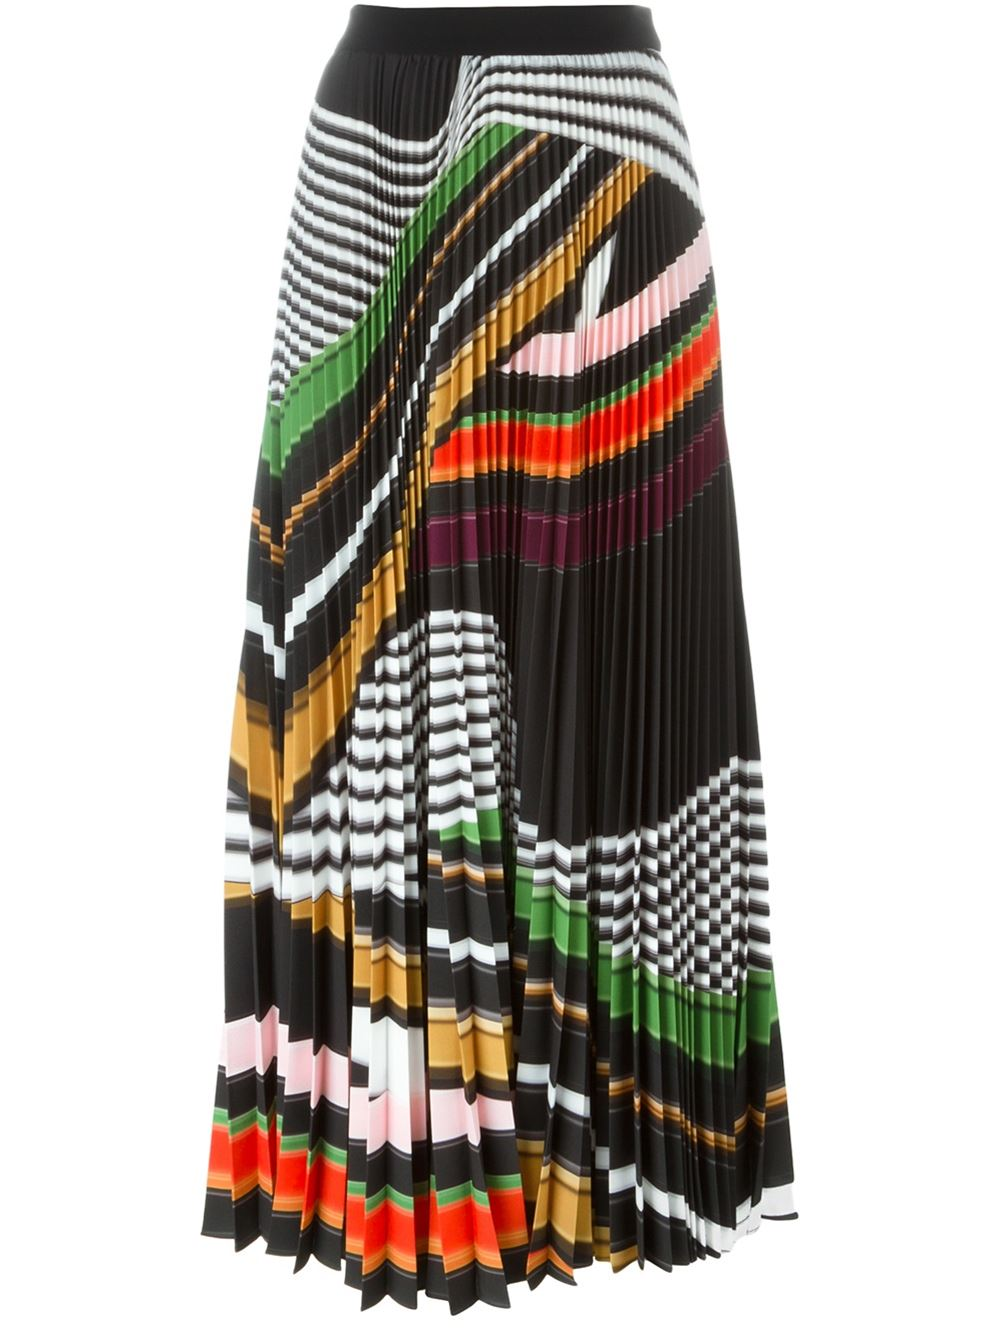 MARY KATRANTZOU 'Pelar' pleated maxi skirt, FarFetch.com